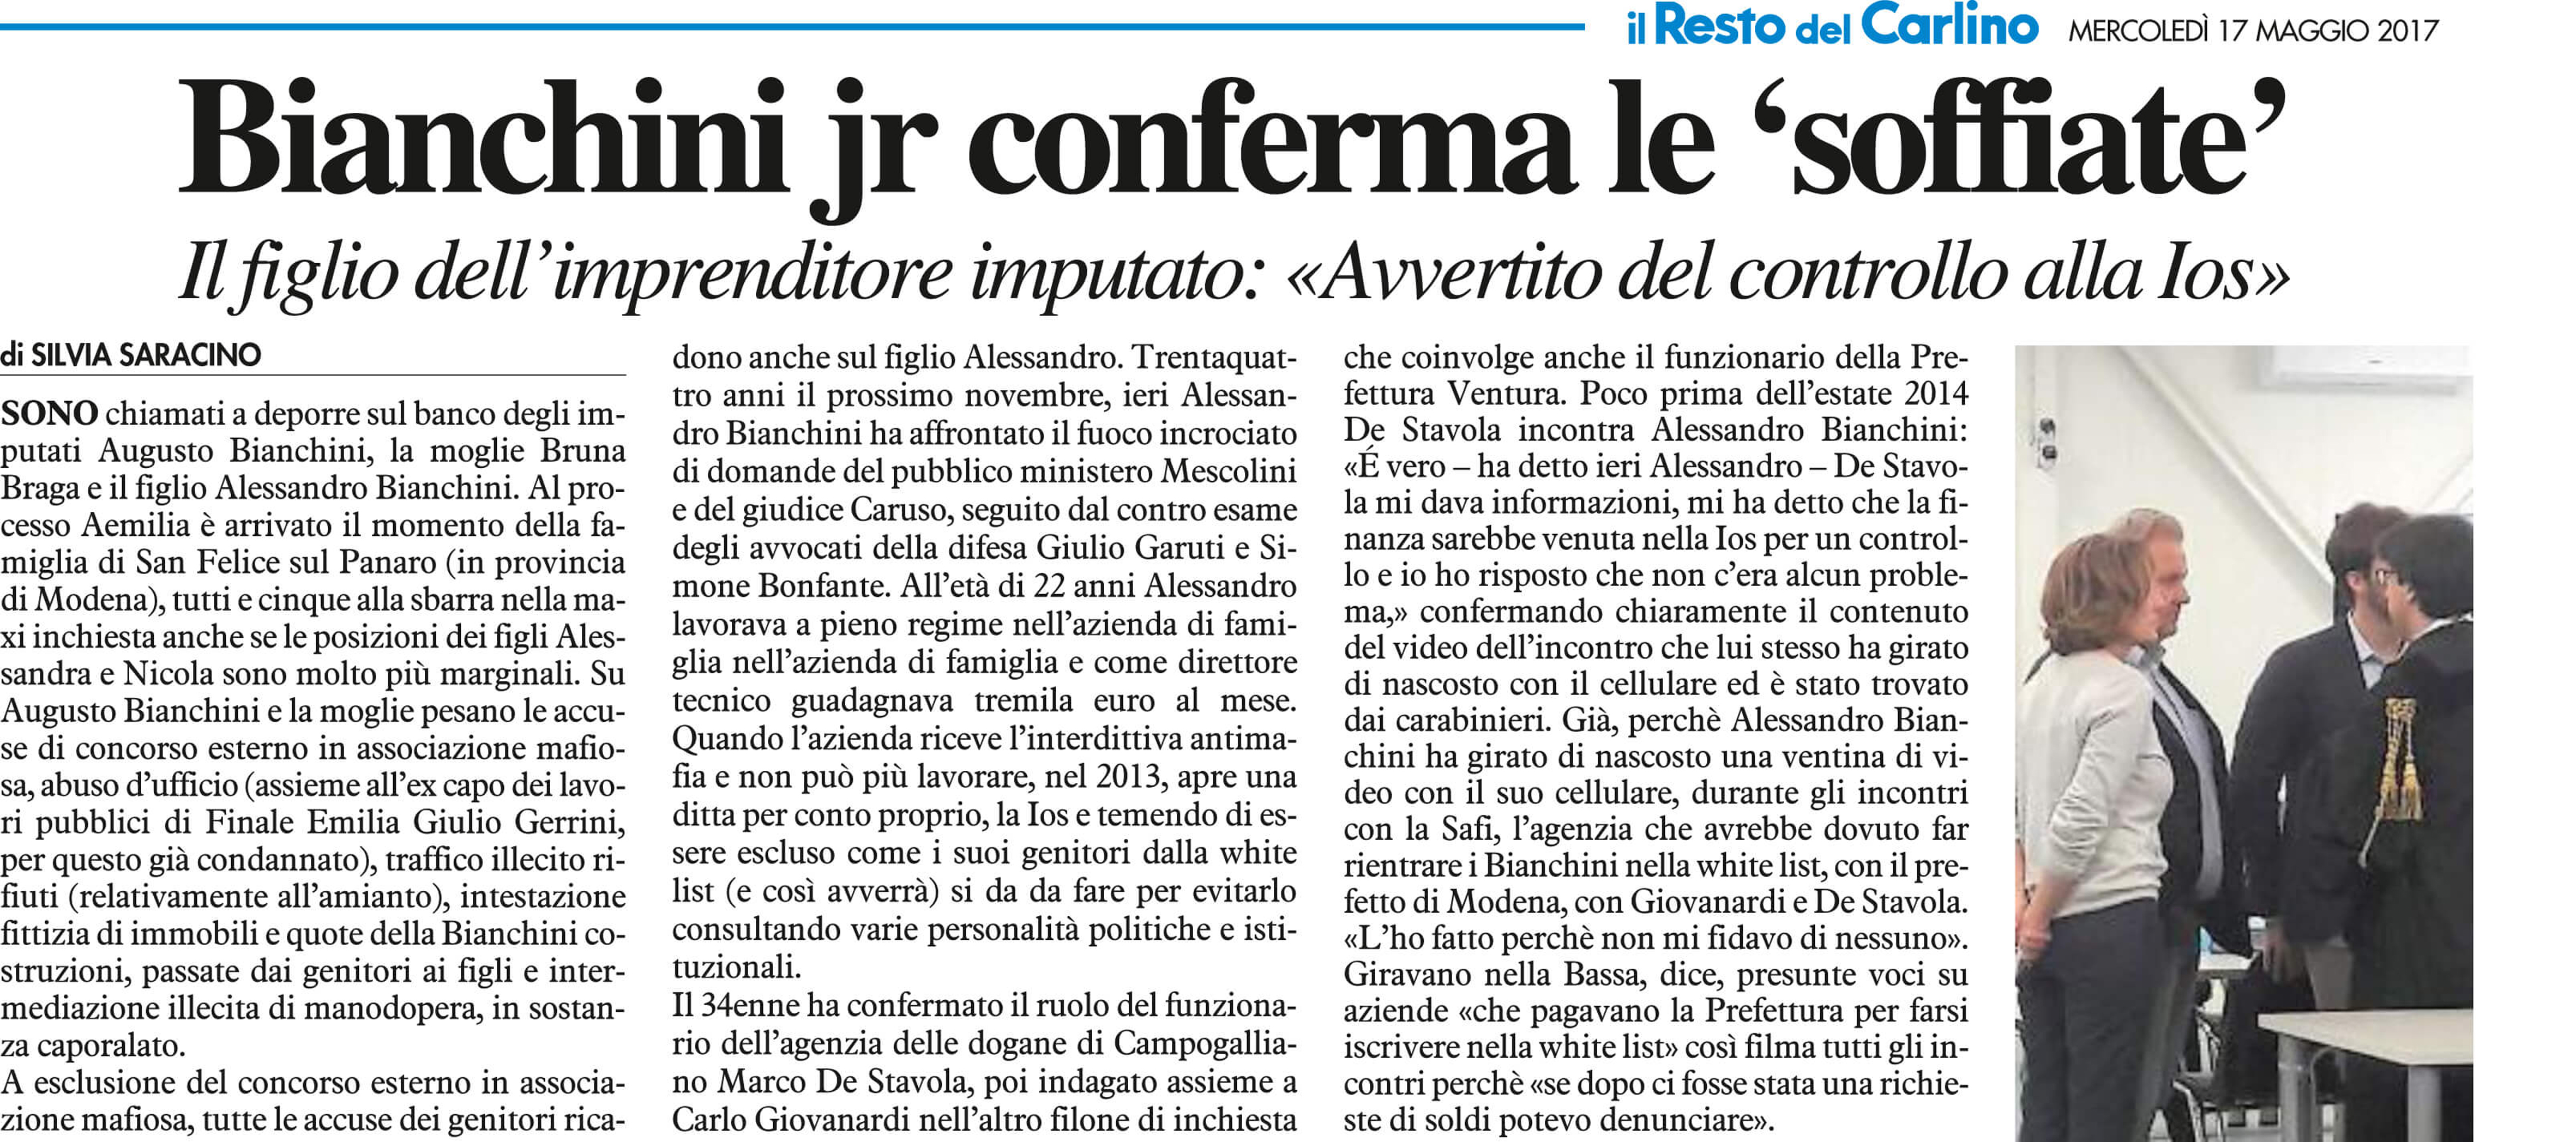 Bianchini jr conferma le soffiate